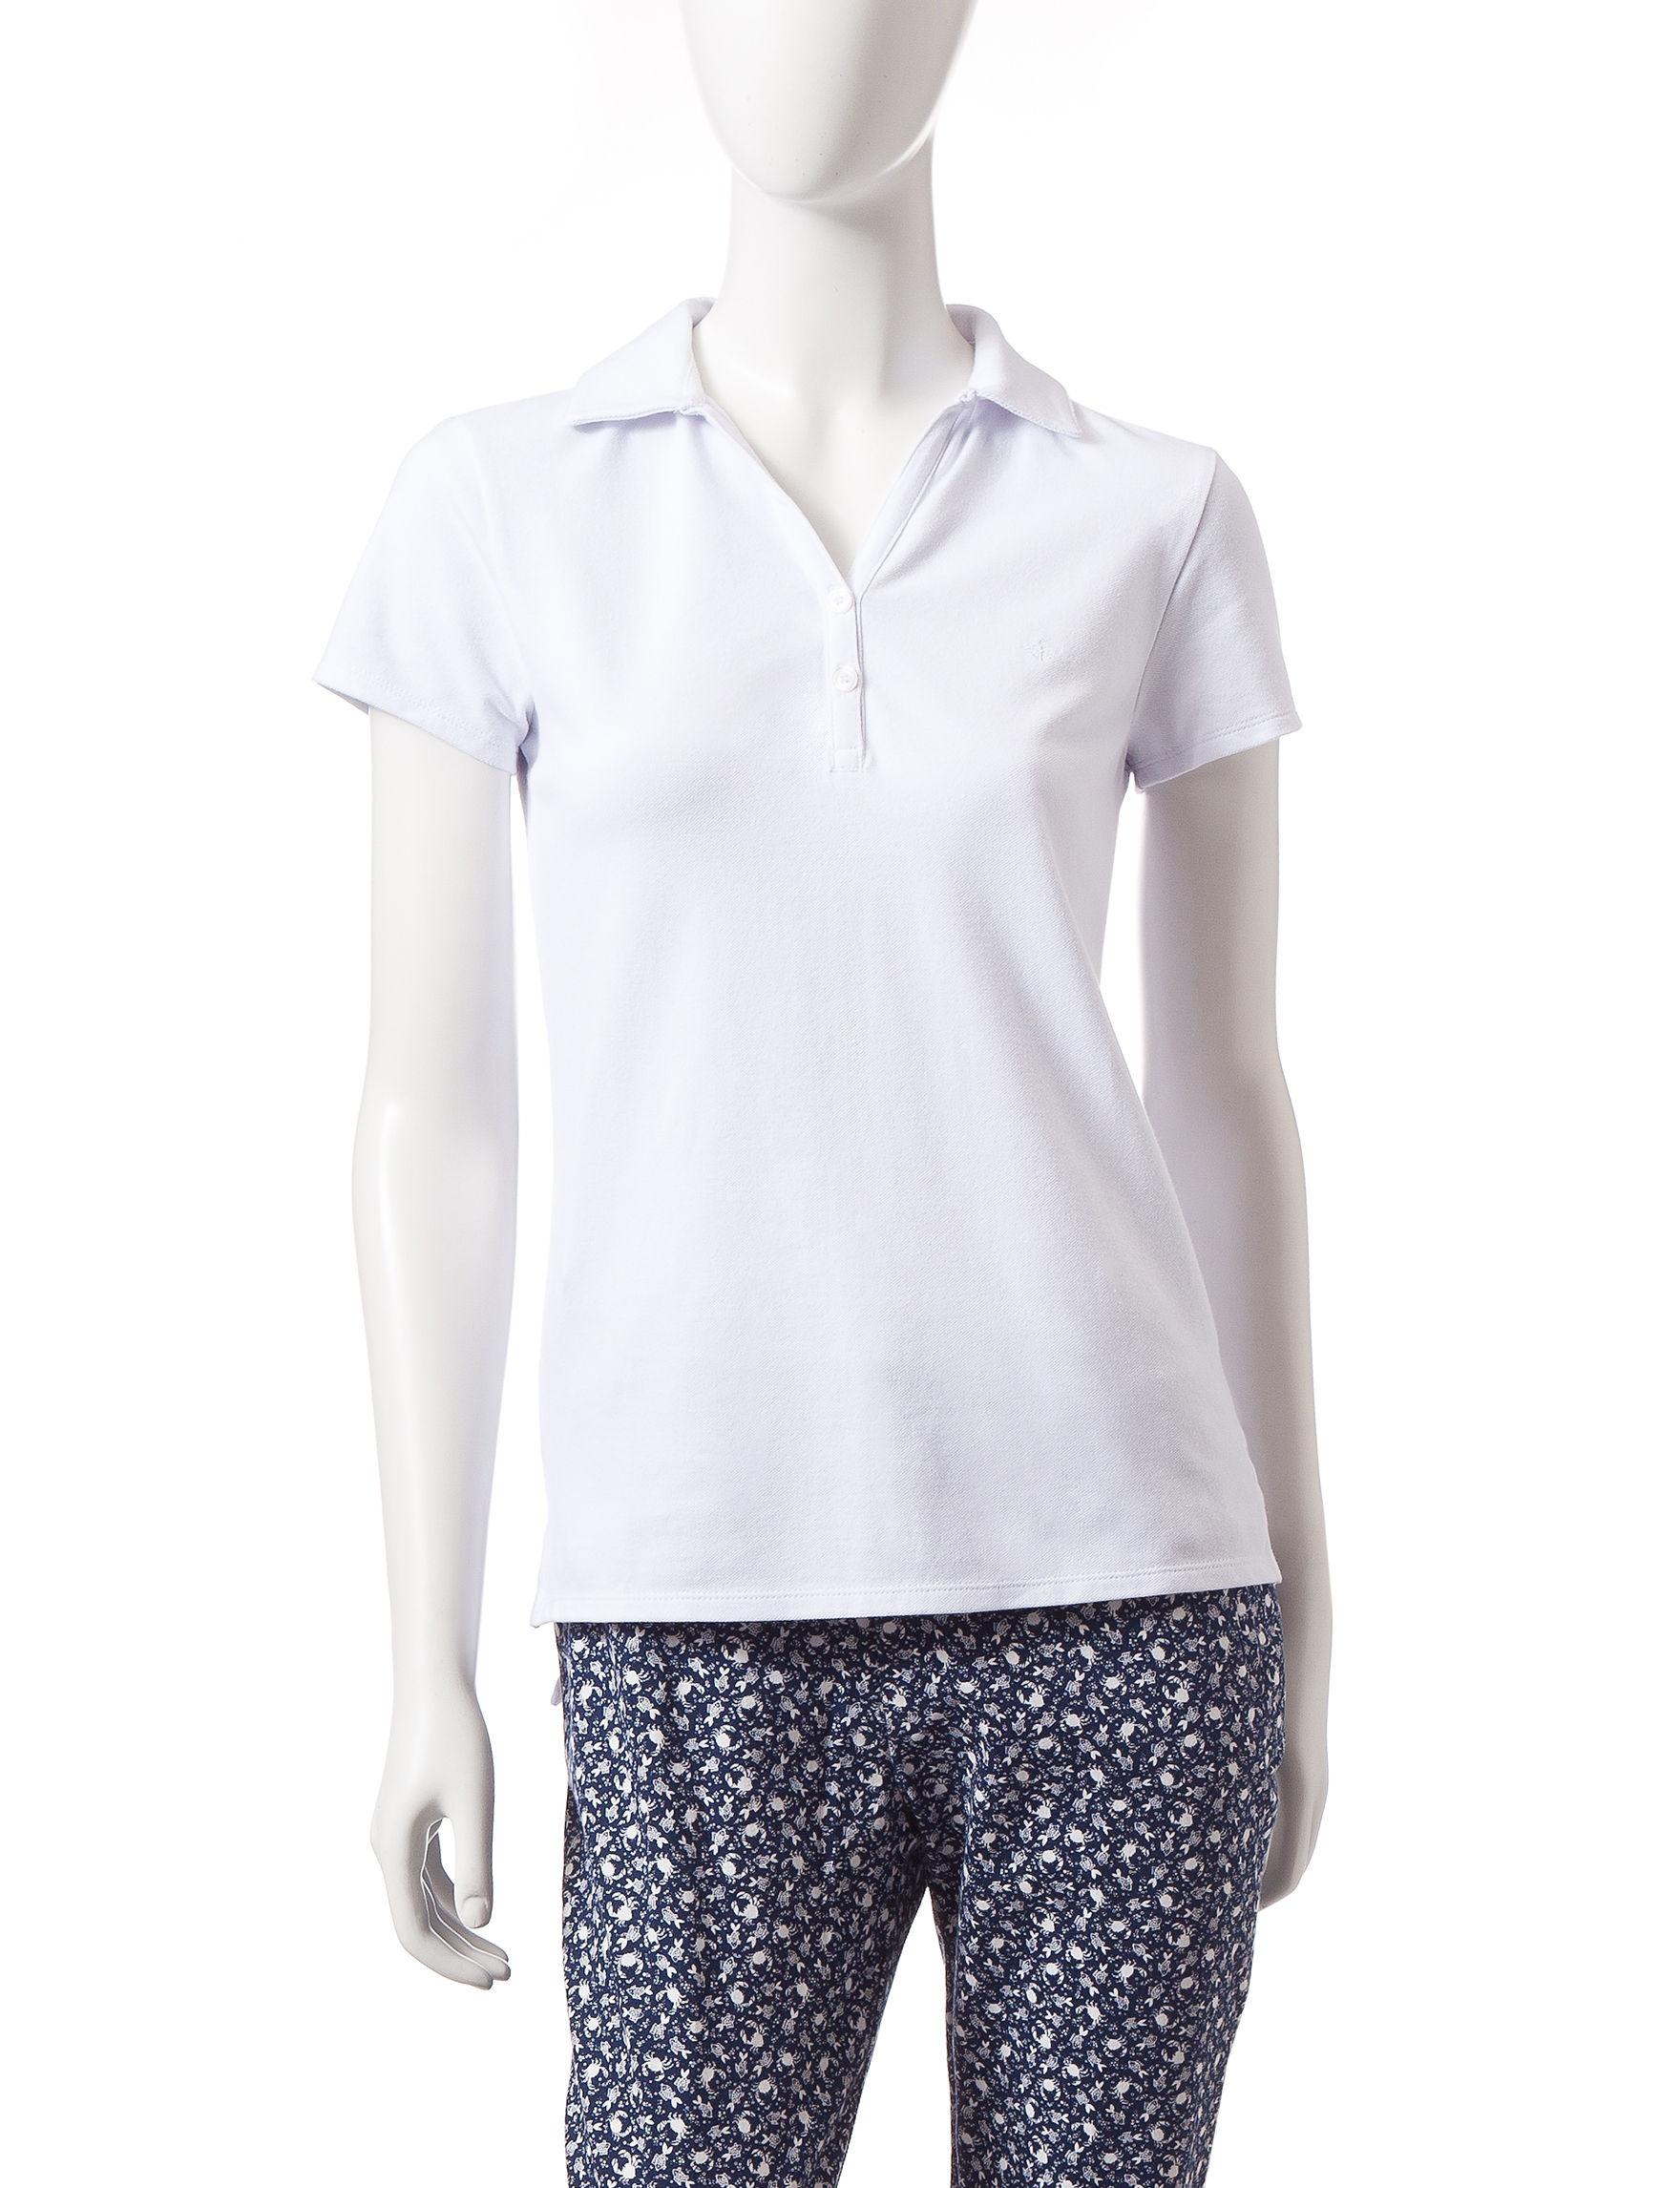 Dockers White Shirts & Blouses